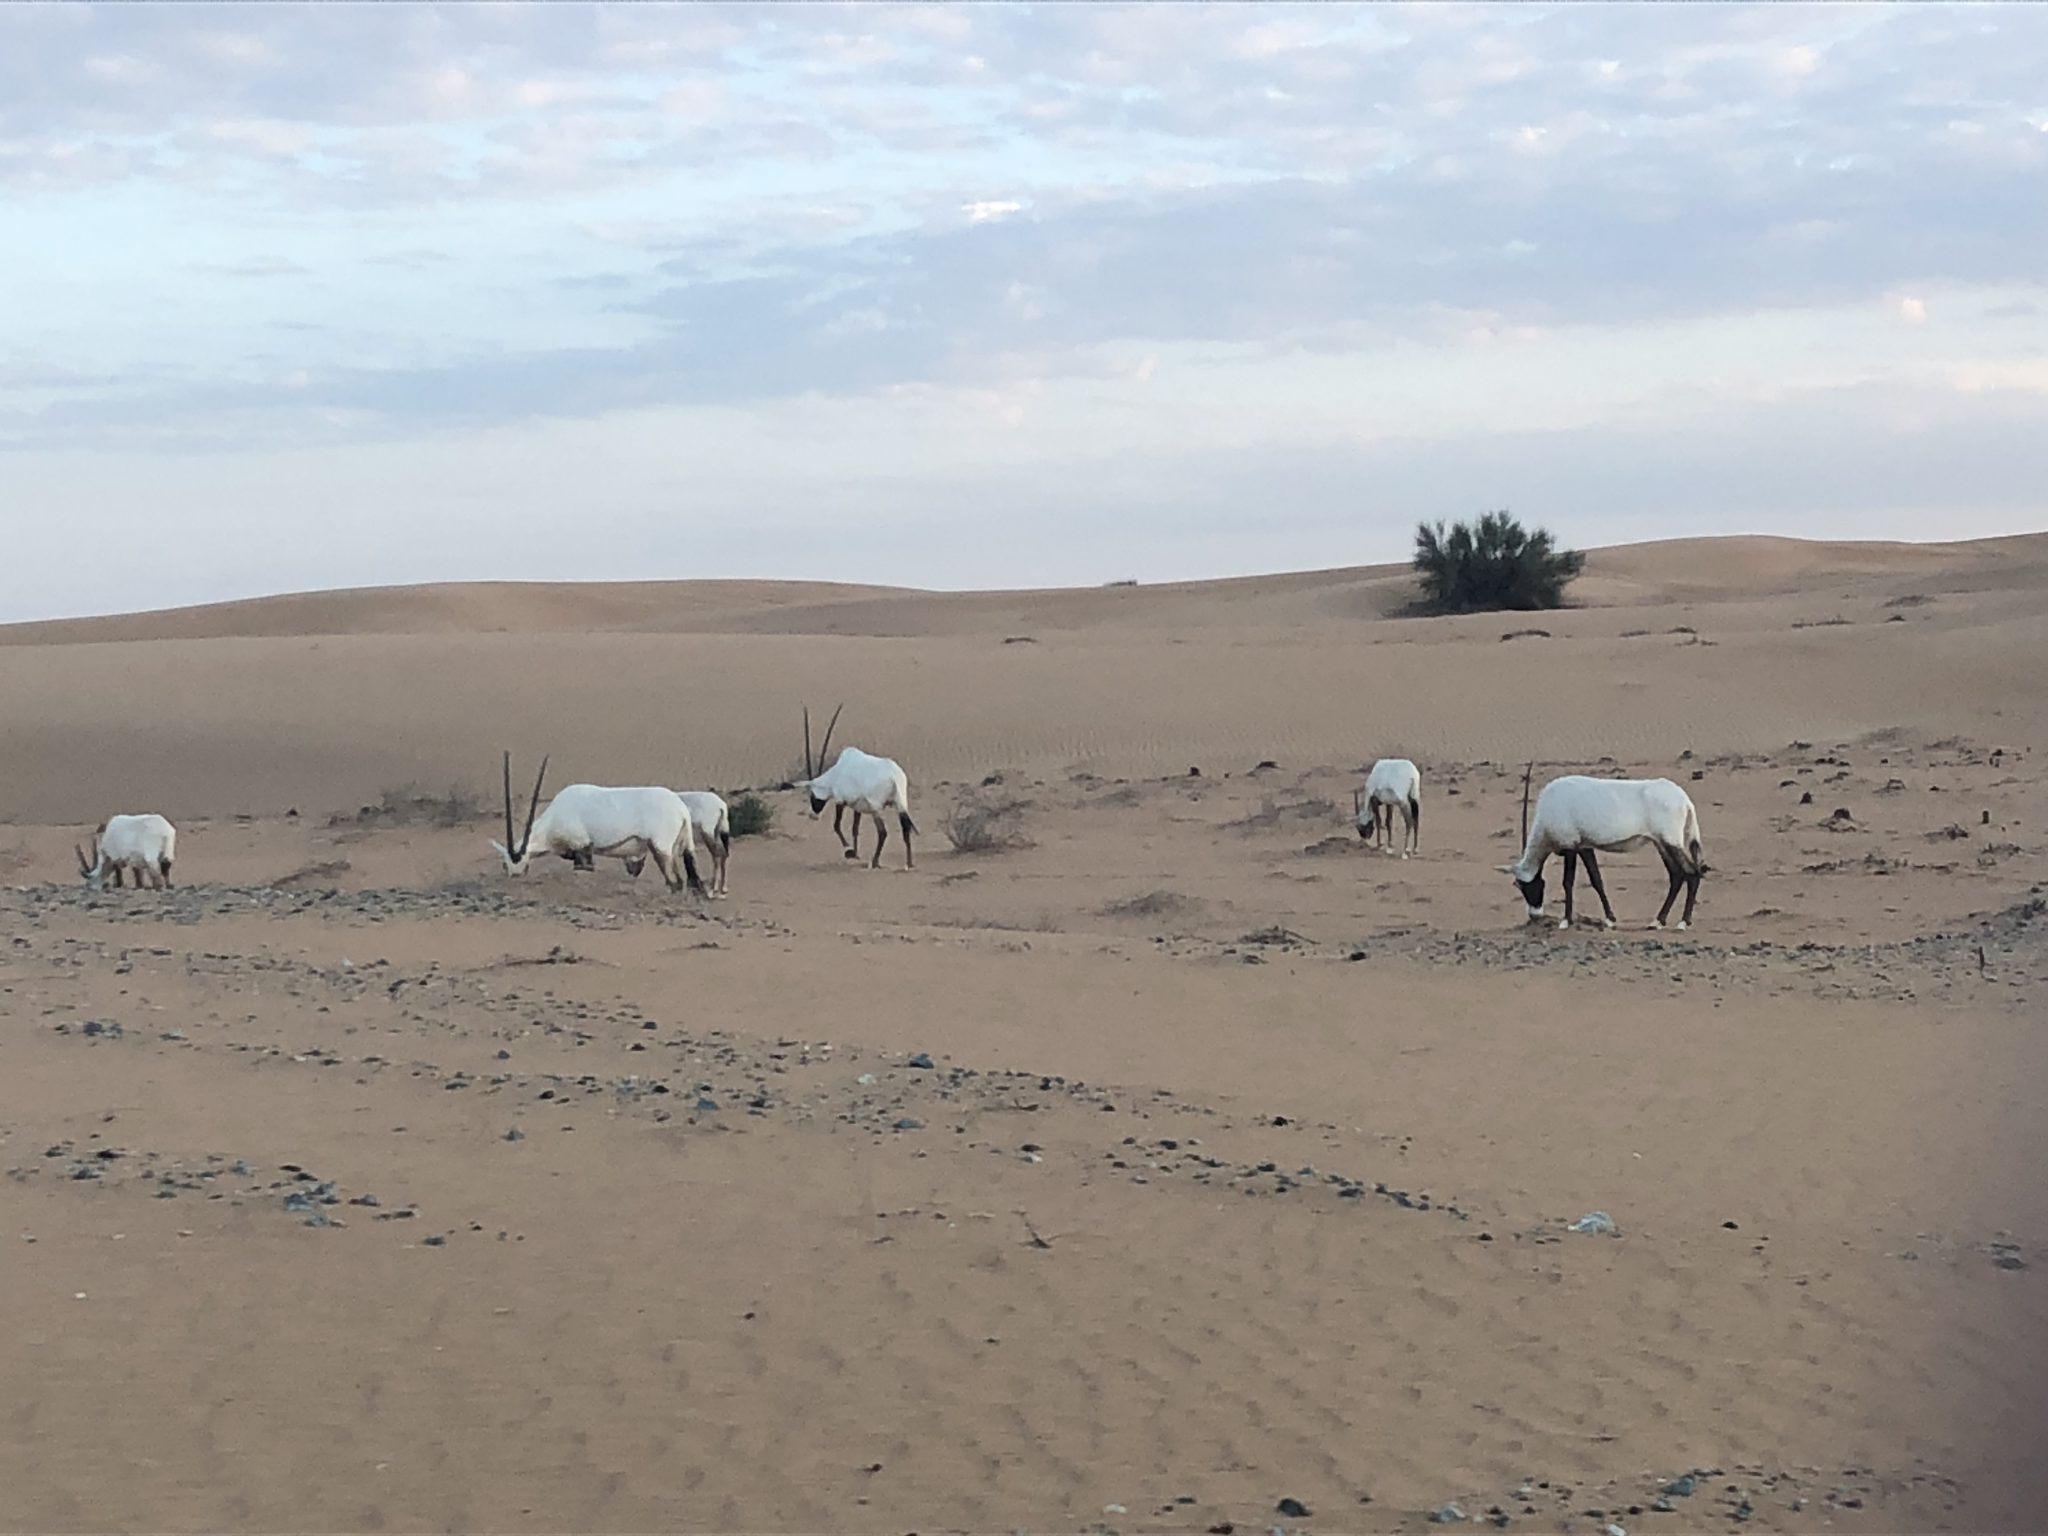 Animal símbolo dos UAE